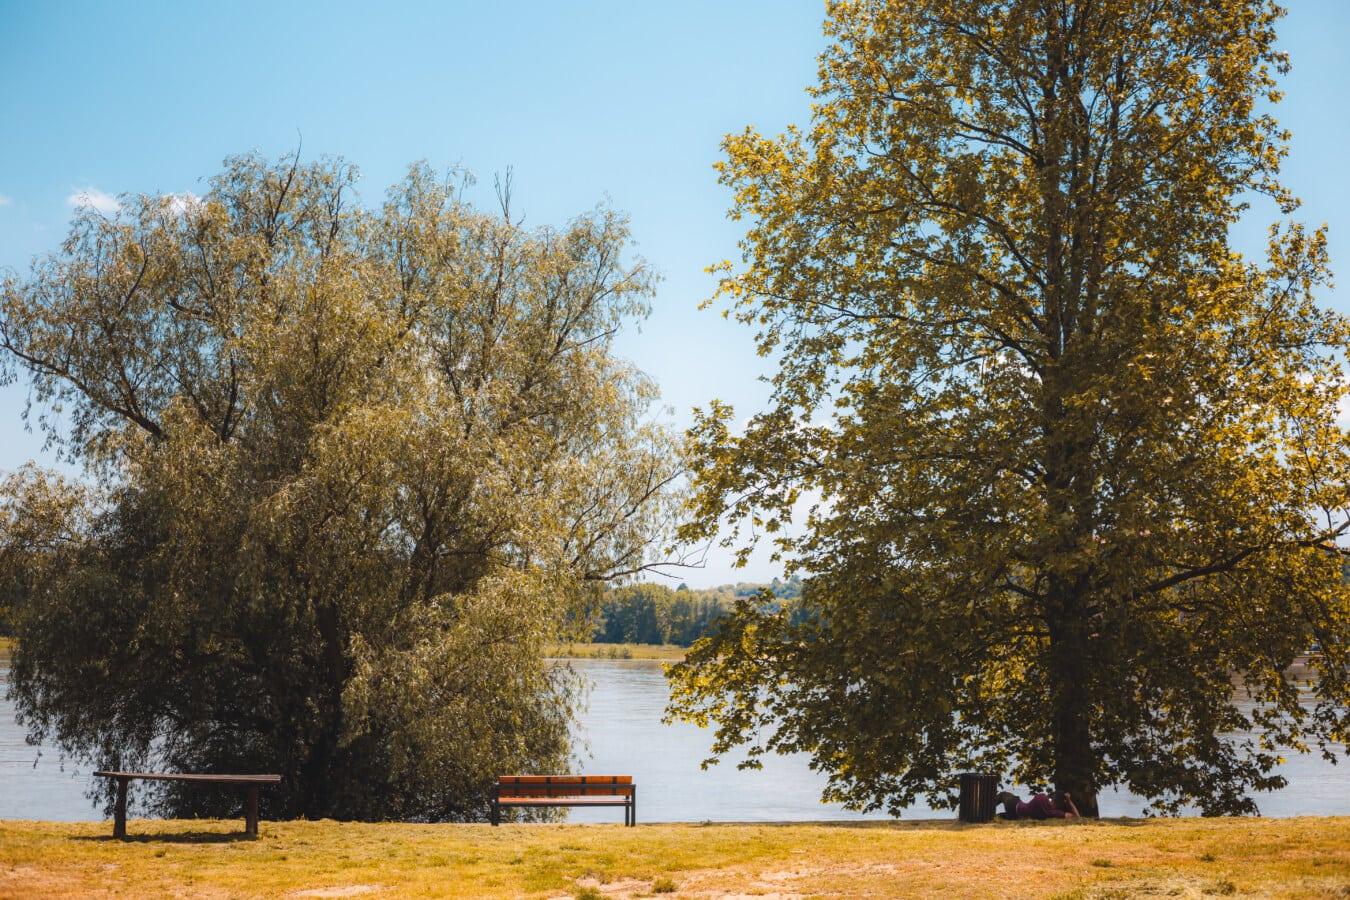 riverbank, summer, river, sunny, day, trees, autumn, leaf, tree, poplar